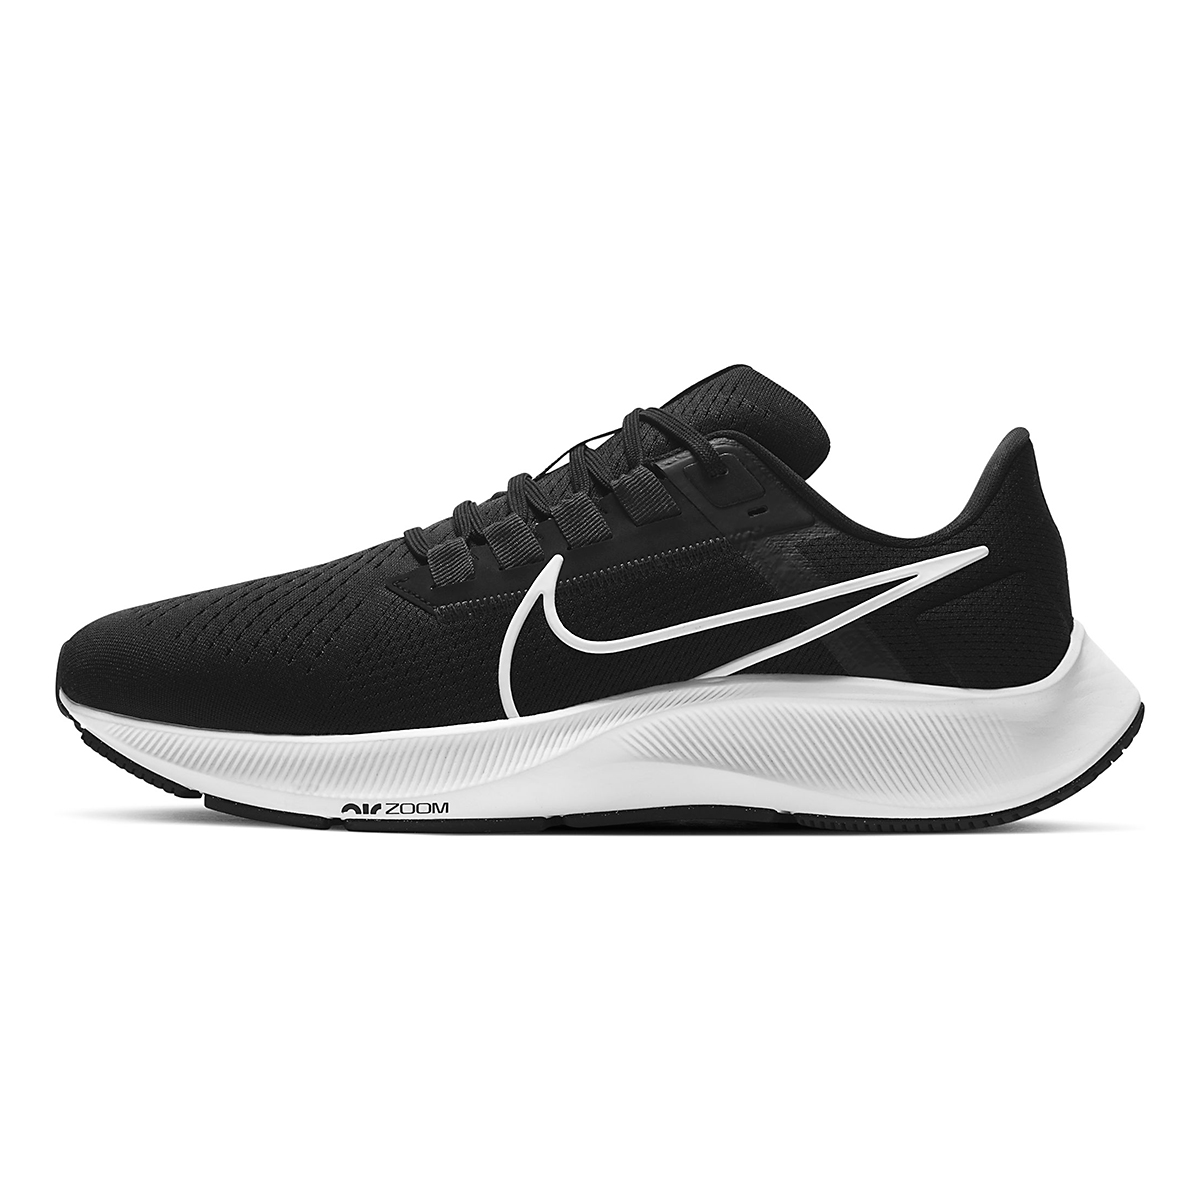 Men's Nike Air Zoom Pegasus 38 Running Shoe - Color: Black/White/Anthracite - Size: 6 - Width: Regular, Black/White/Anthracite, large, image 2